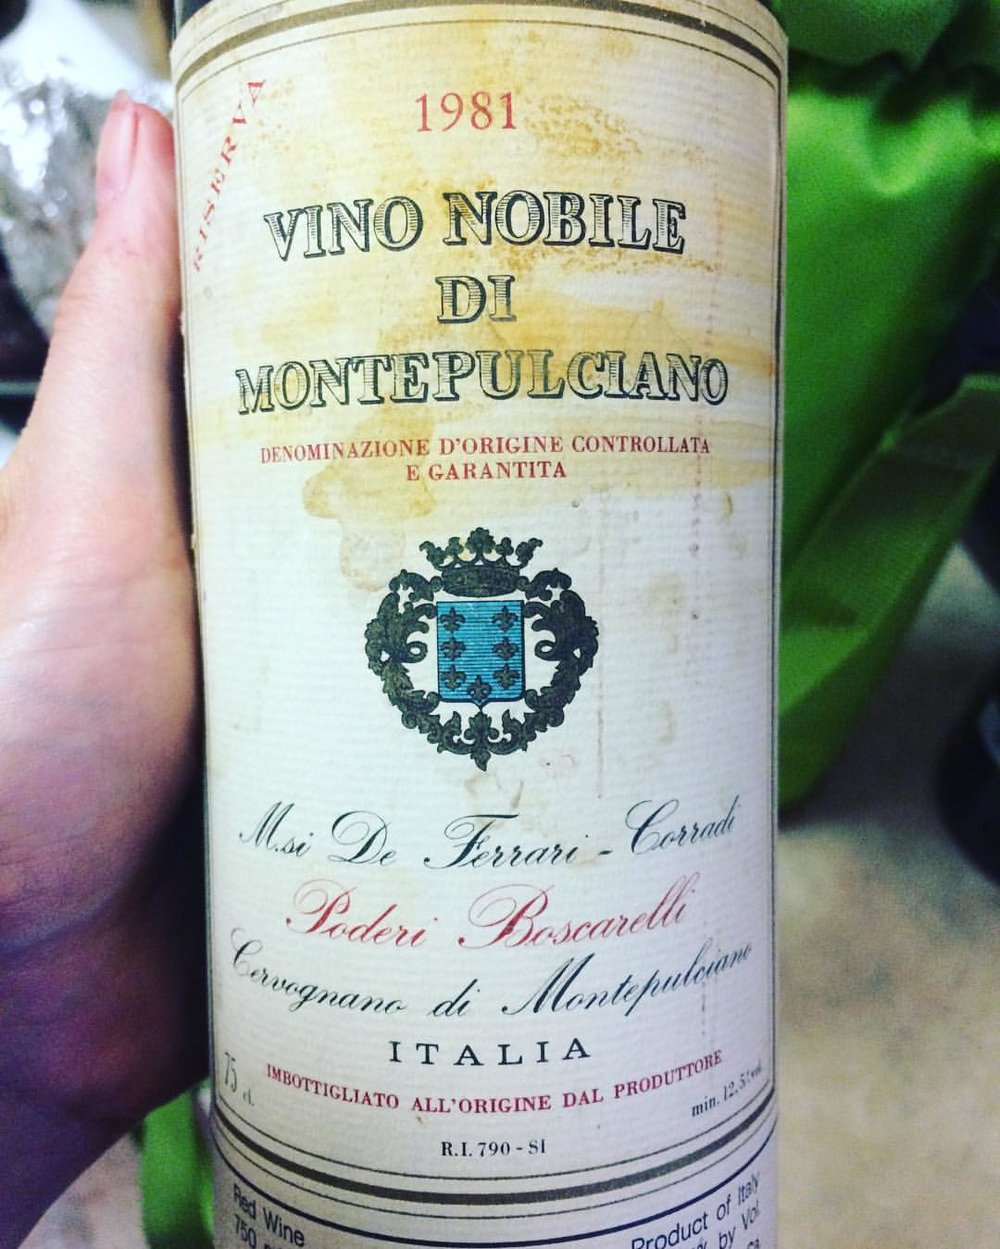 Poderi Boscarelli, Vino Nobile de Montepulciano, Tuscany